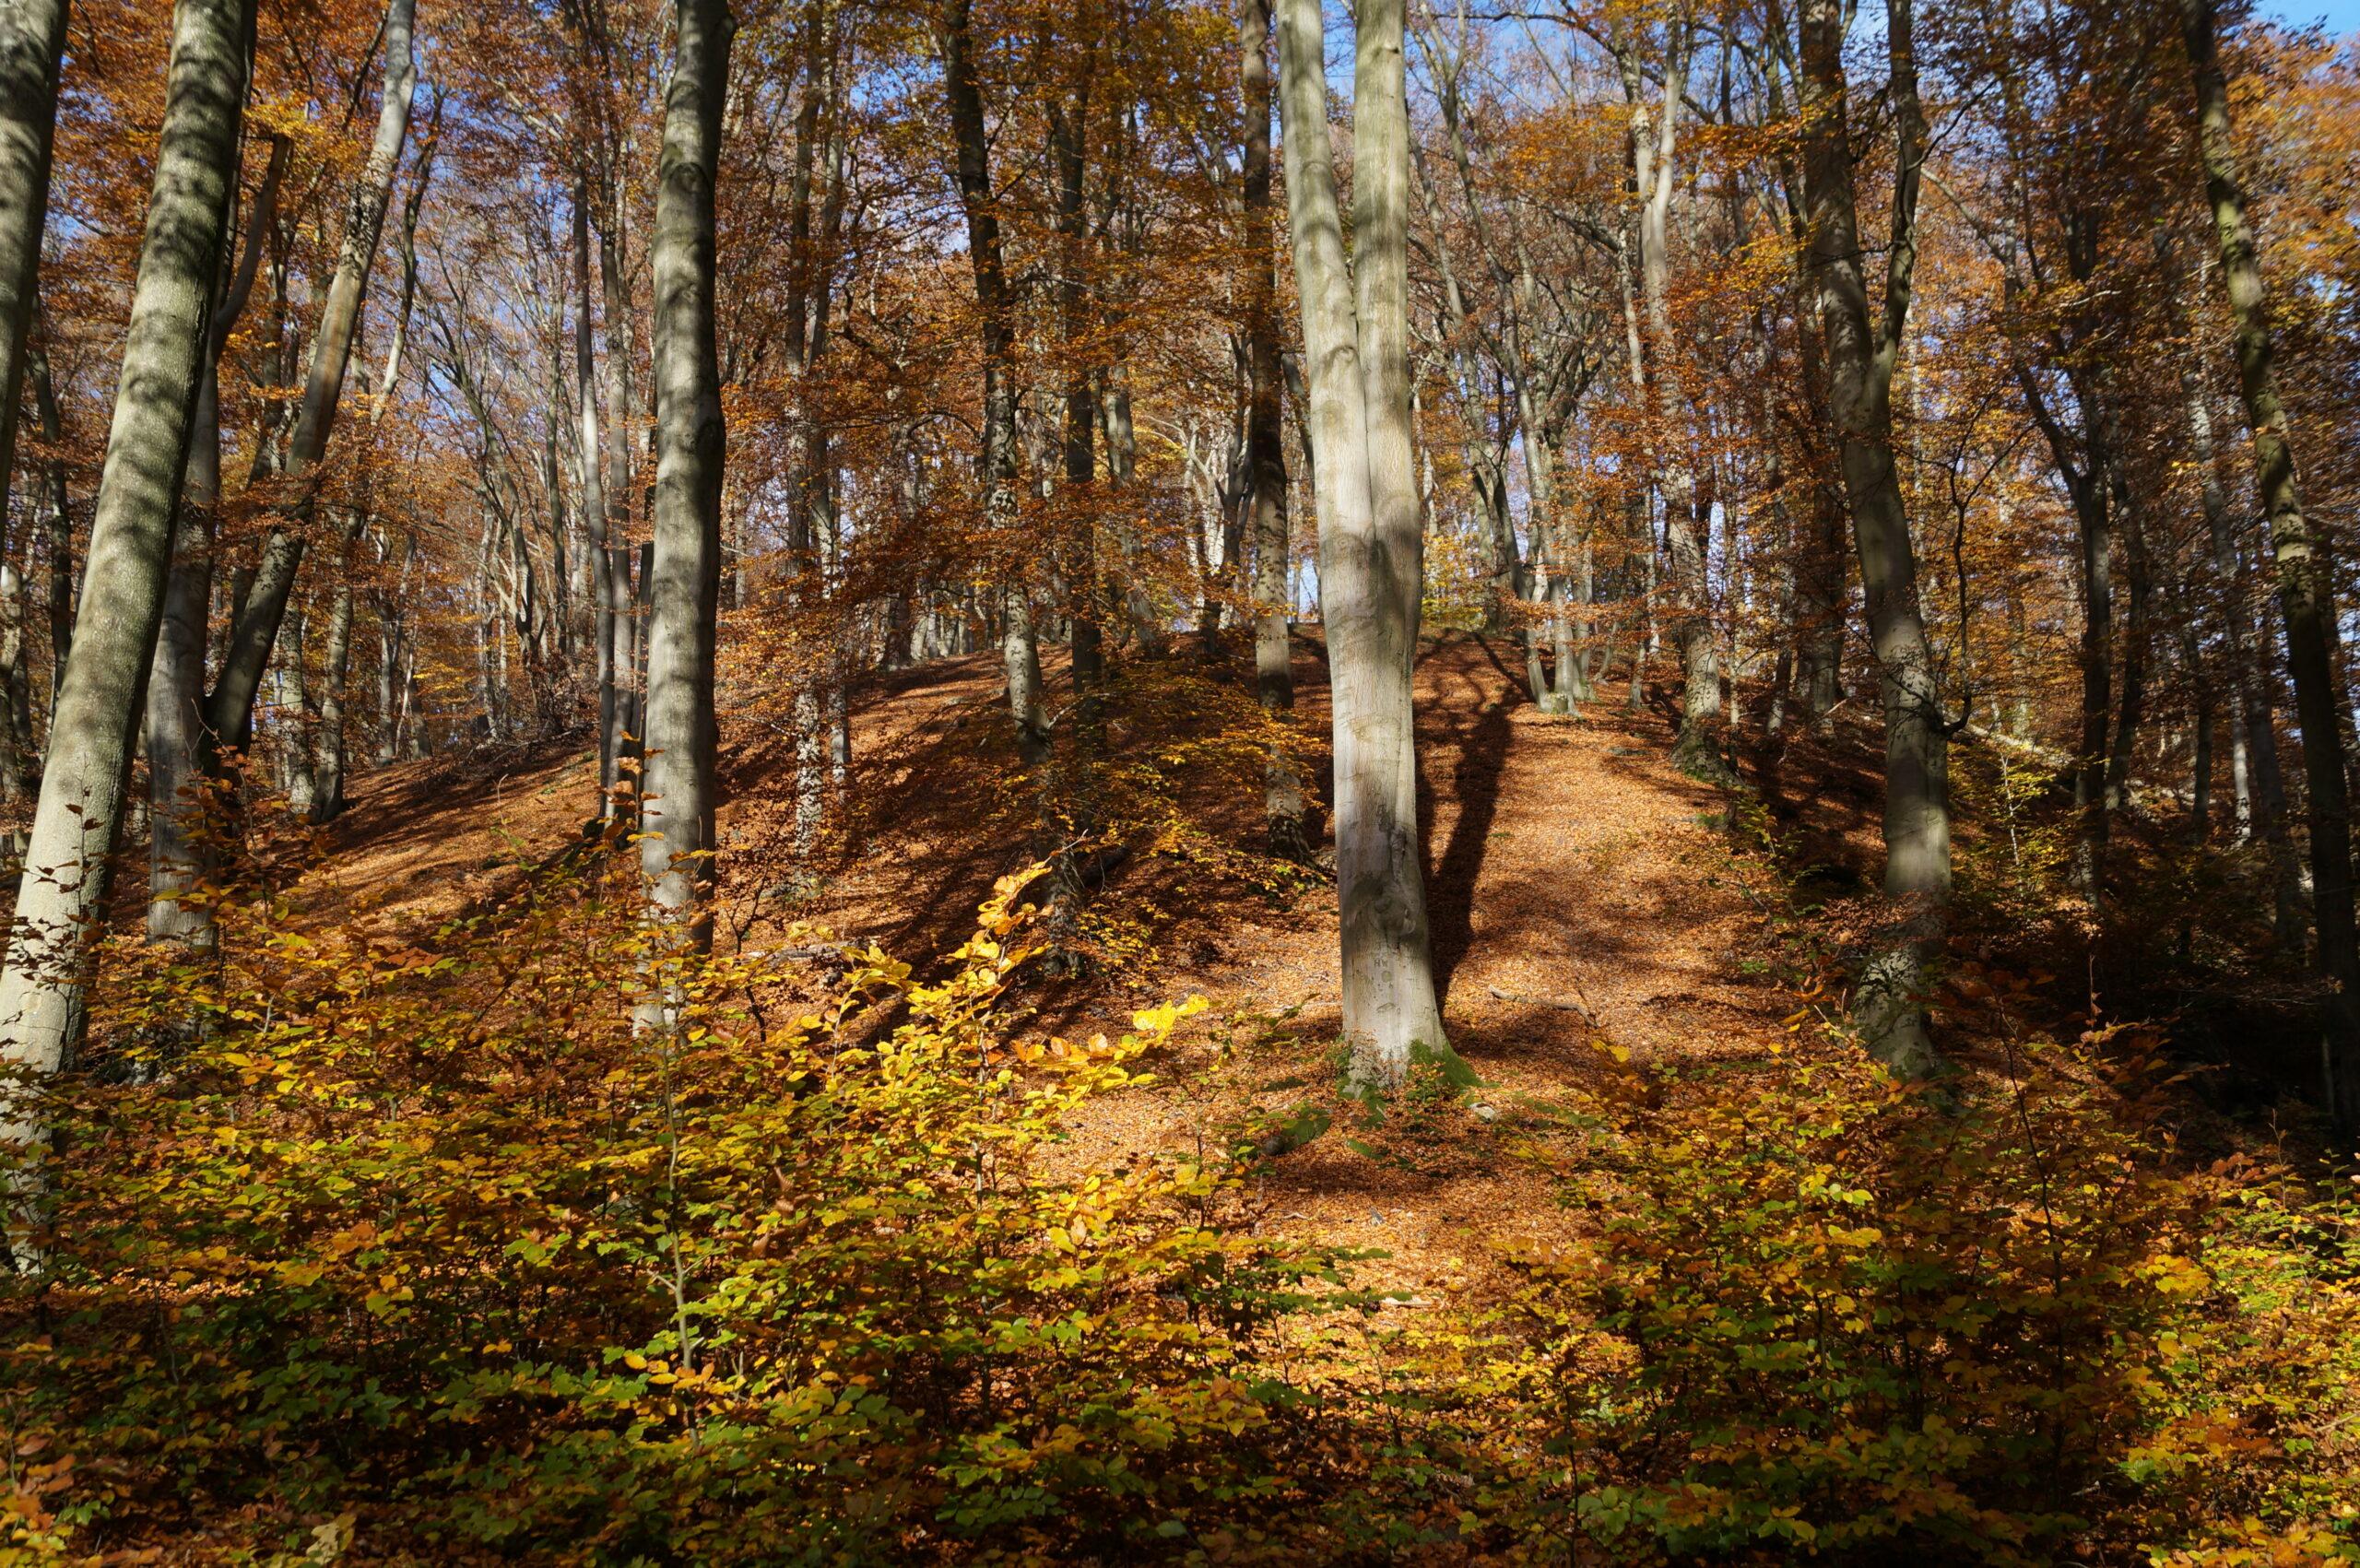 Herbstwaldwanderung in die Wahner Heide